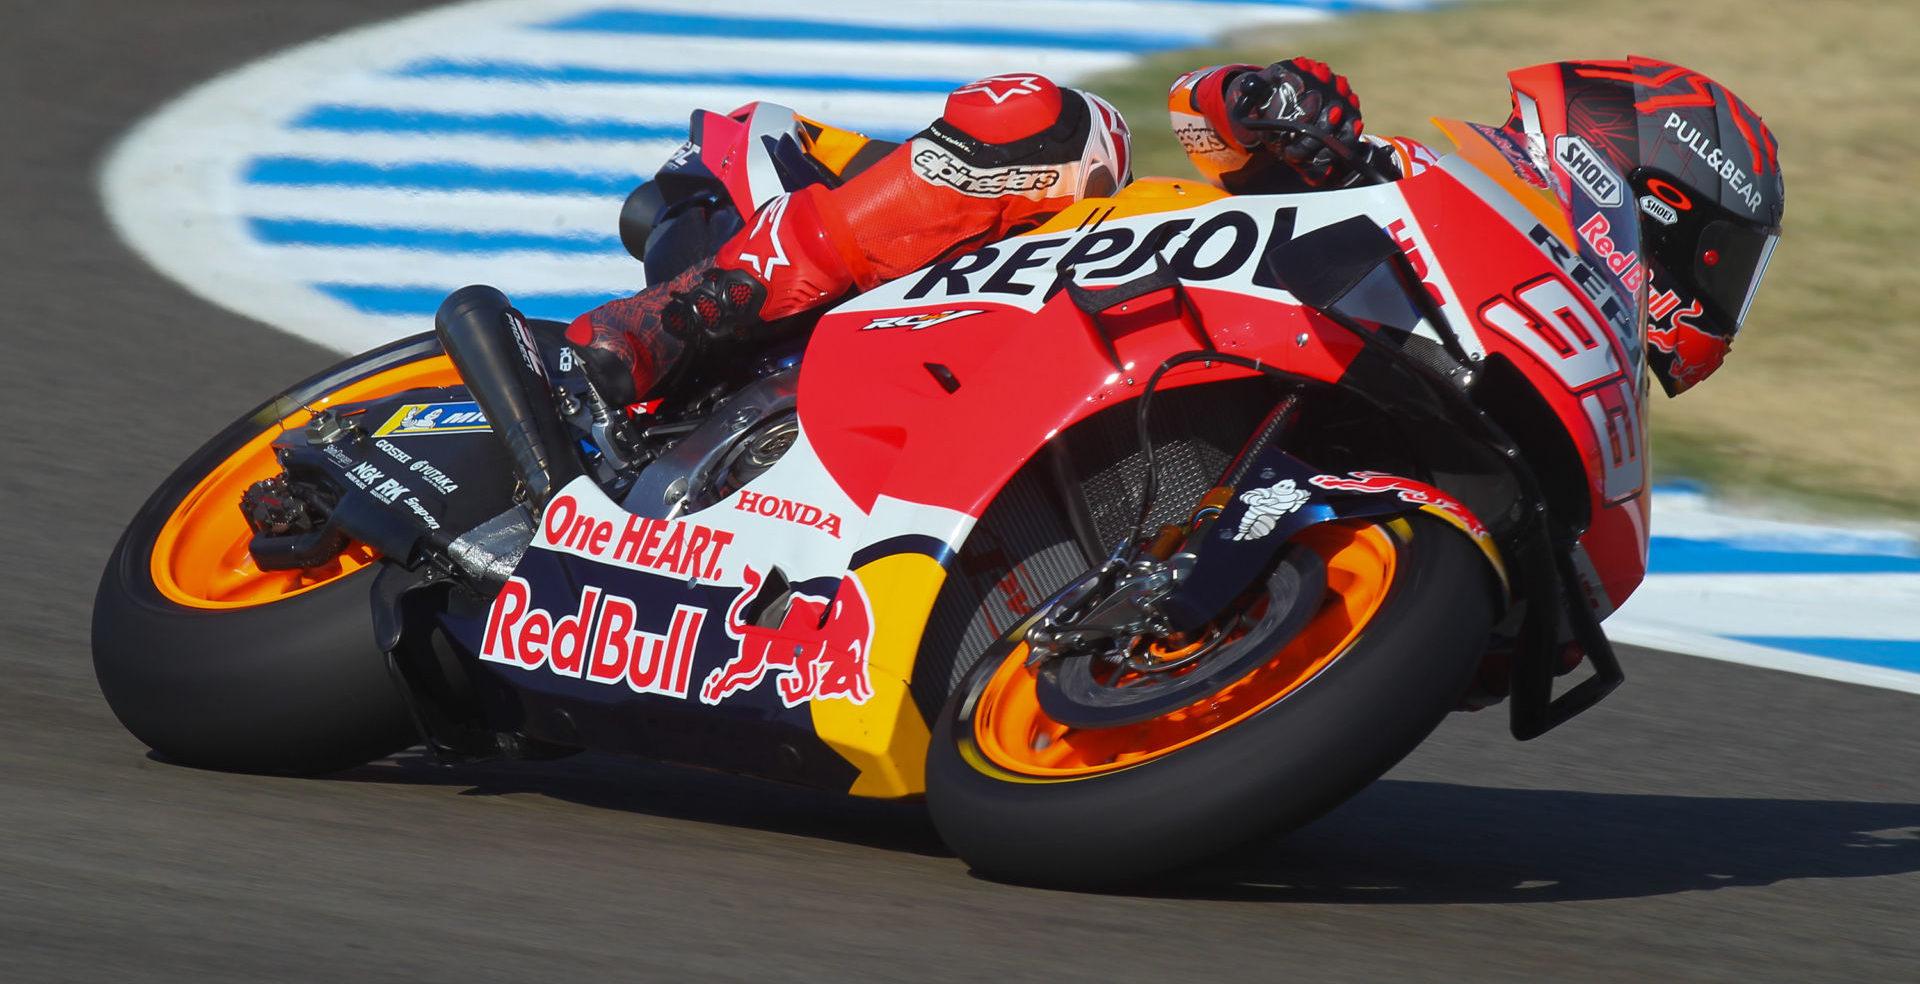 Motogp How Marc Marquez Might Race Next Weekend Roadracing World Magazine Motorcycle Riding Racing Tech News